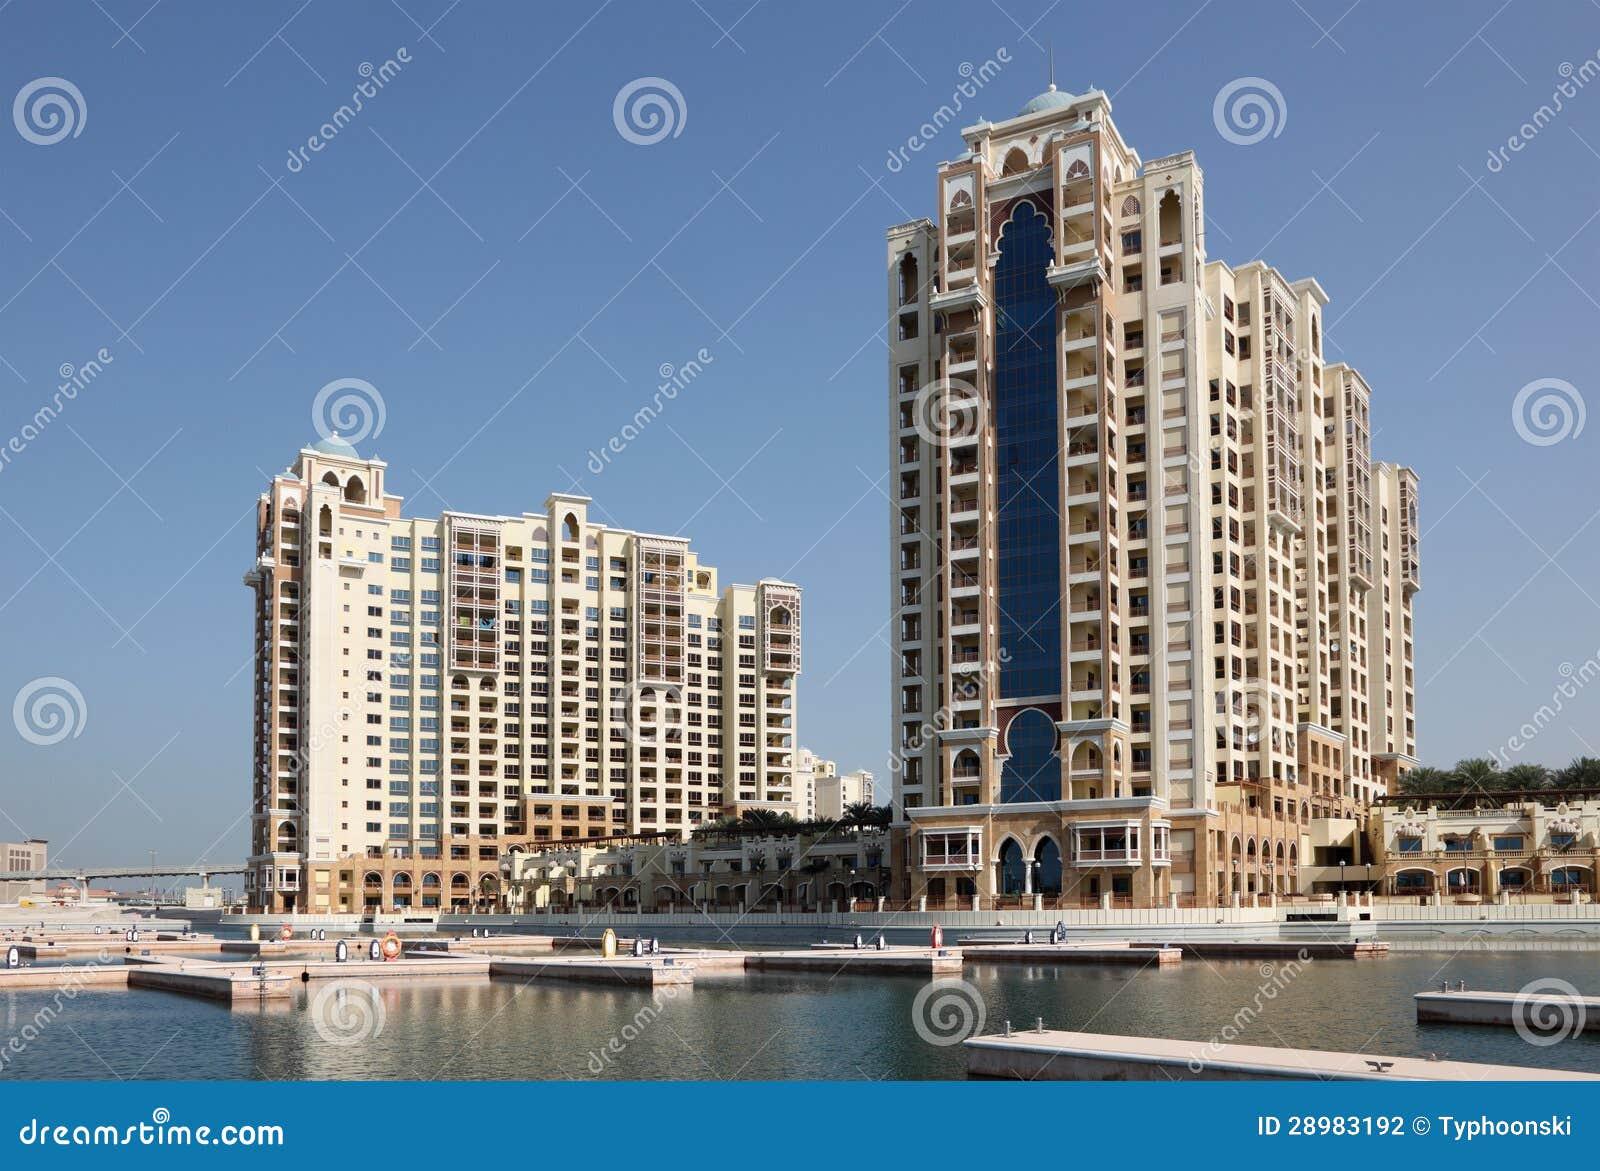 Highrisewohngebäude auf palme jumeirah dubai arabische emirate